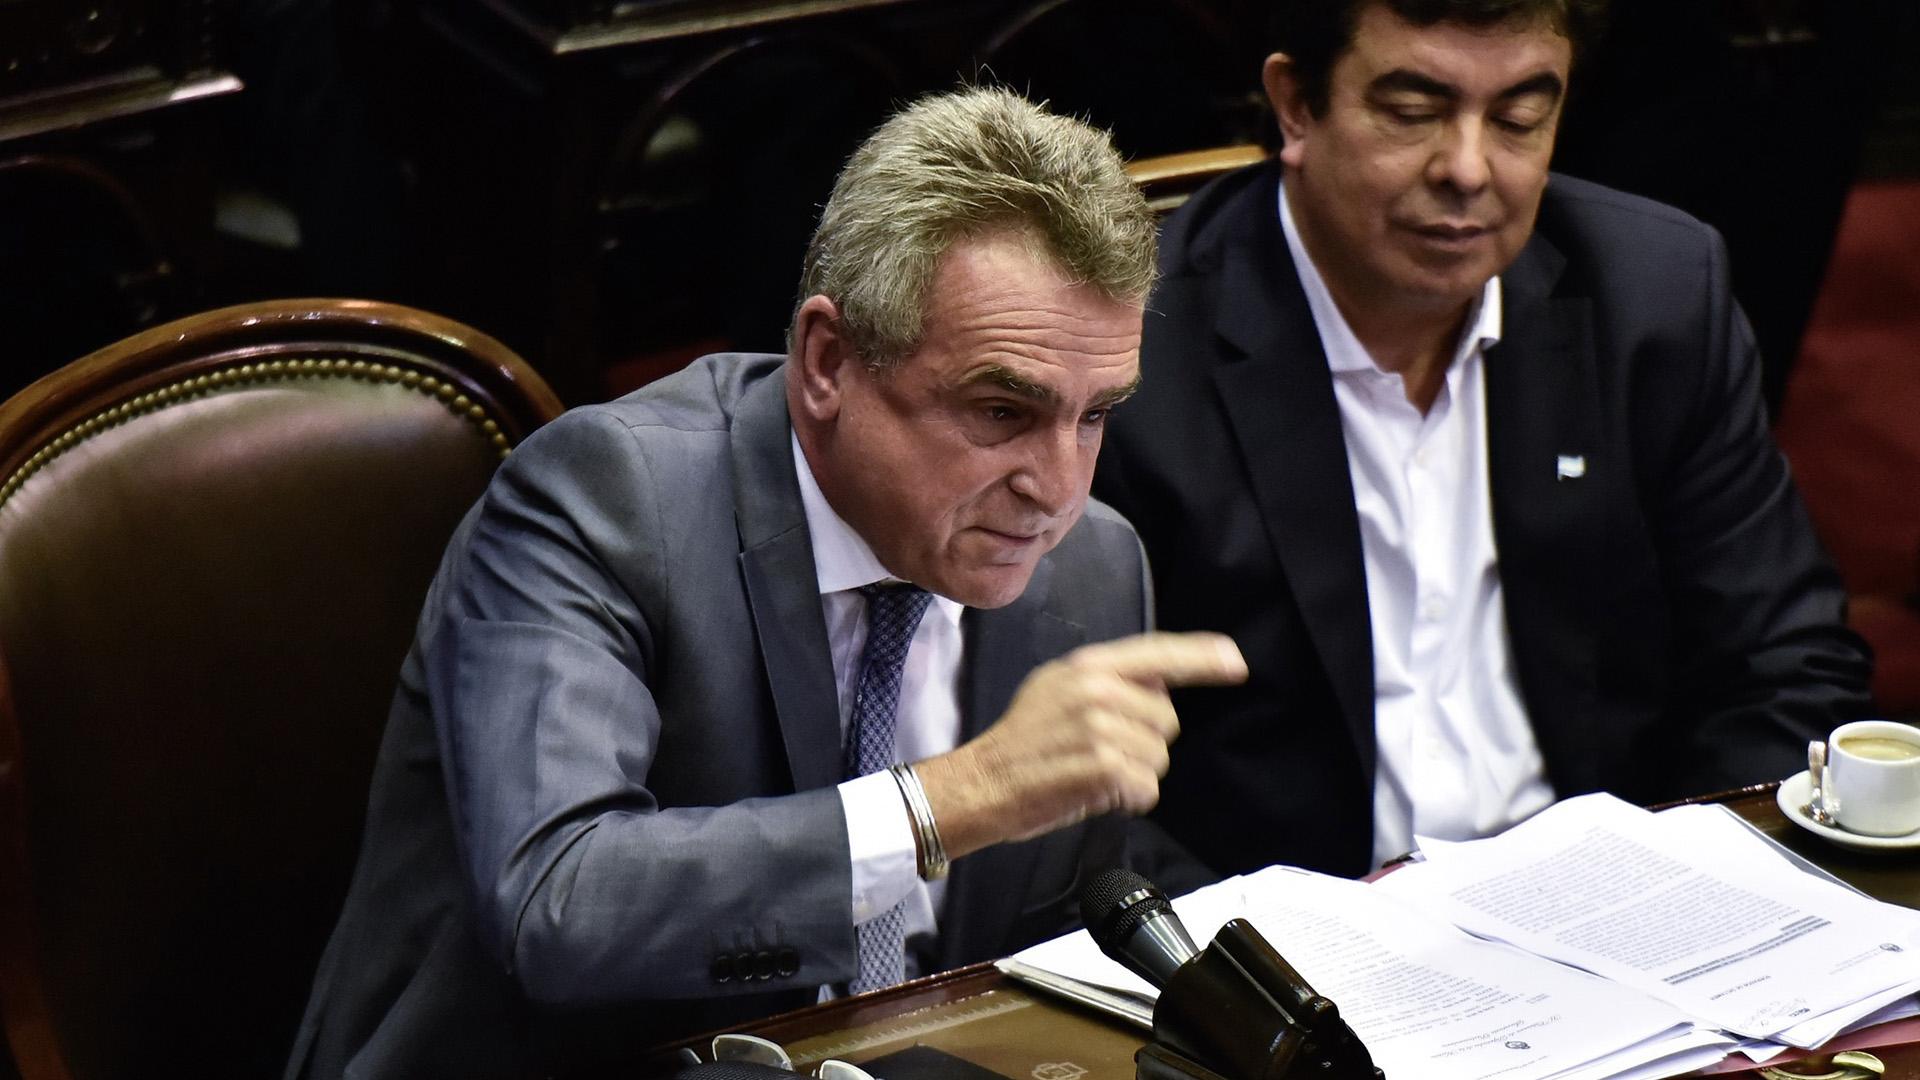 Agustín Rossi, presidente del bloque de legisladores del kirchnerismo